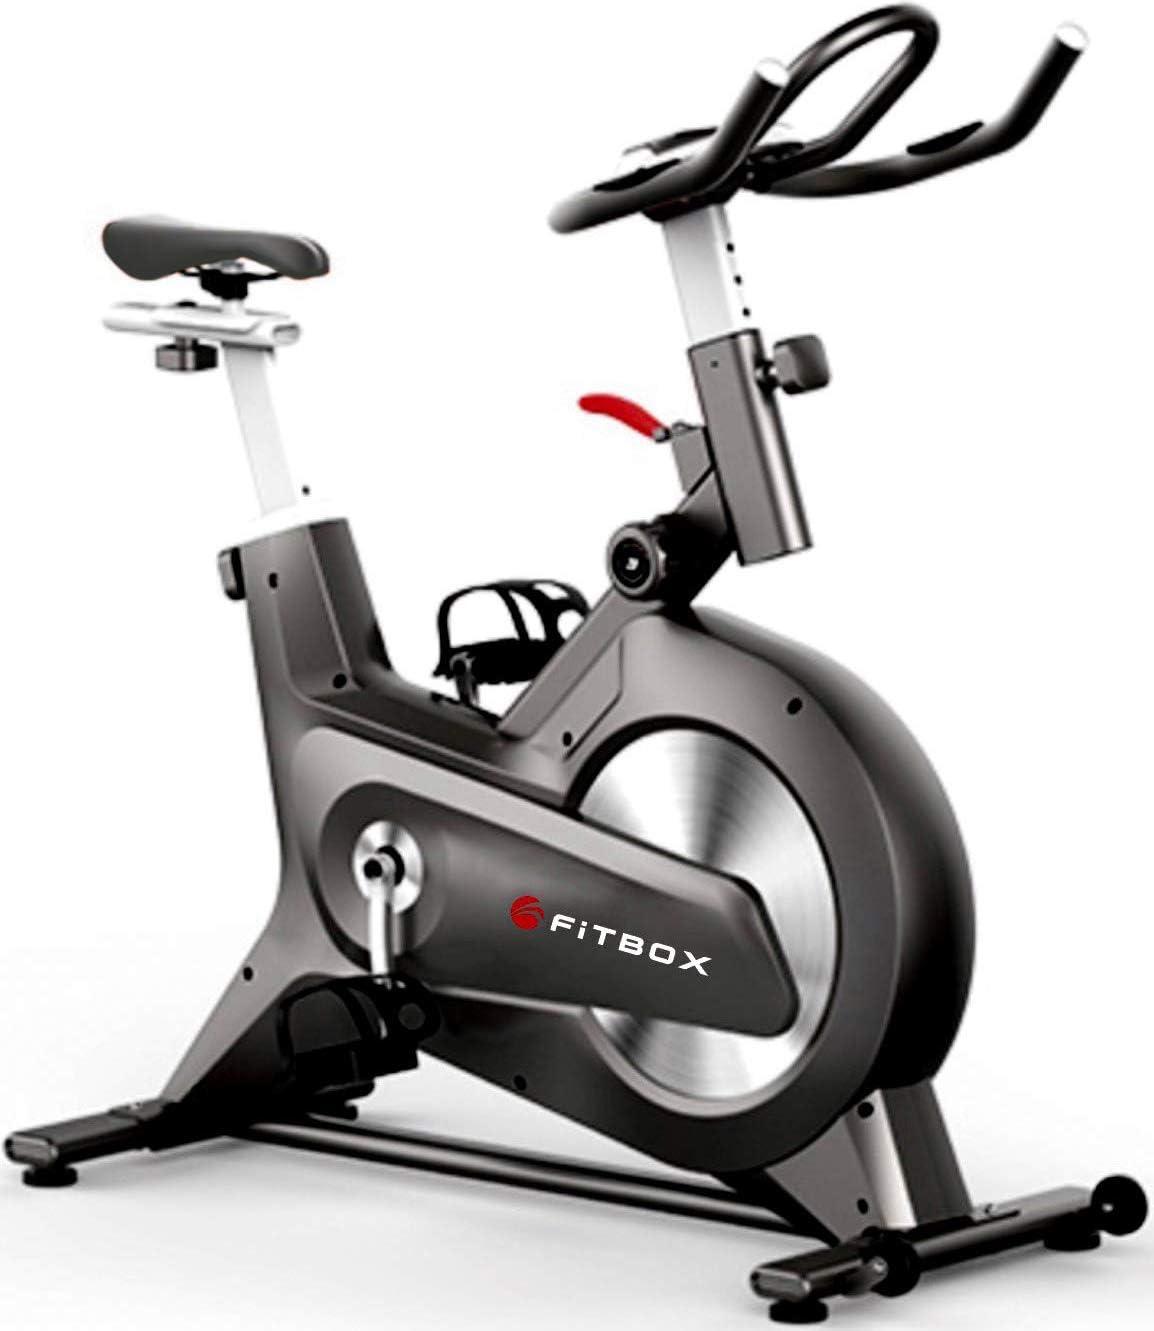 FiTBOX 第3世代フィットネスバイク スピンバイク ダイエット器具 メーカー1年保証 組み立て簡単 静穏 トレーニング トレーニングバイク